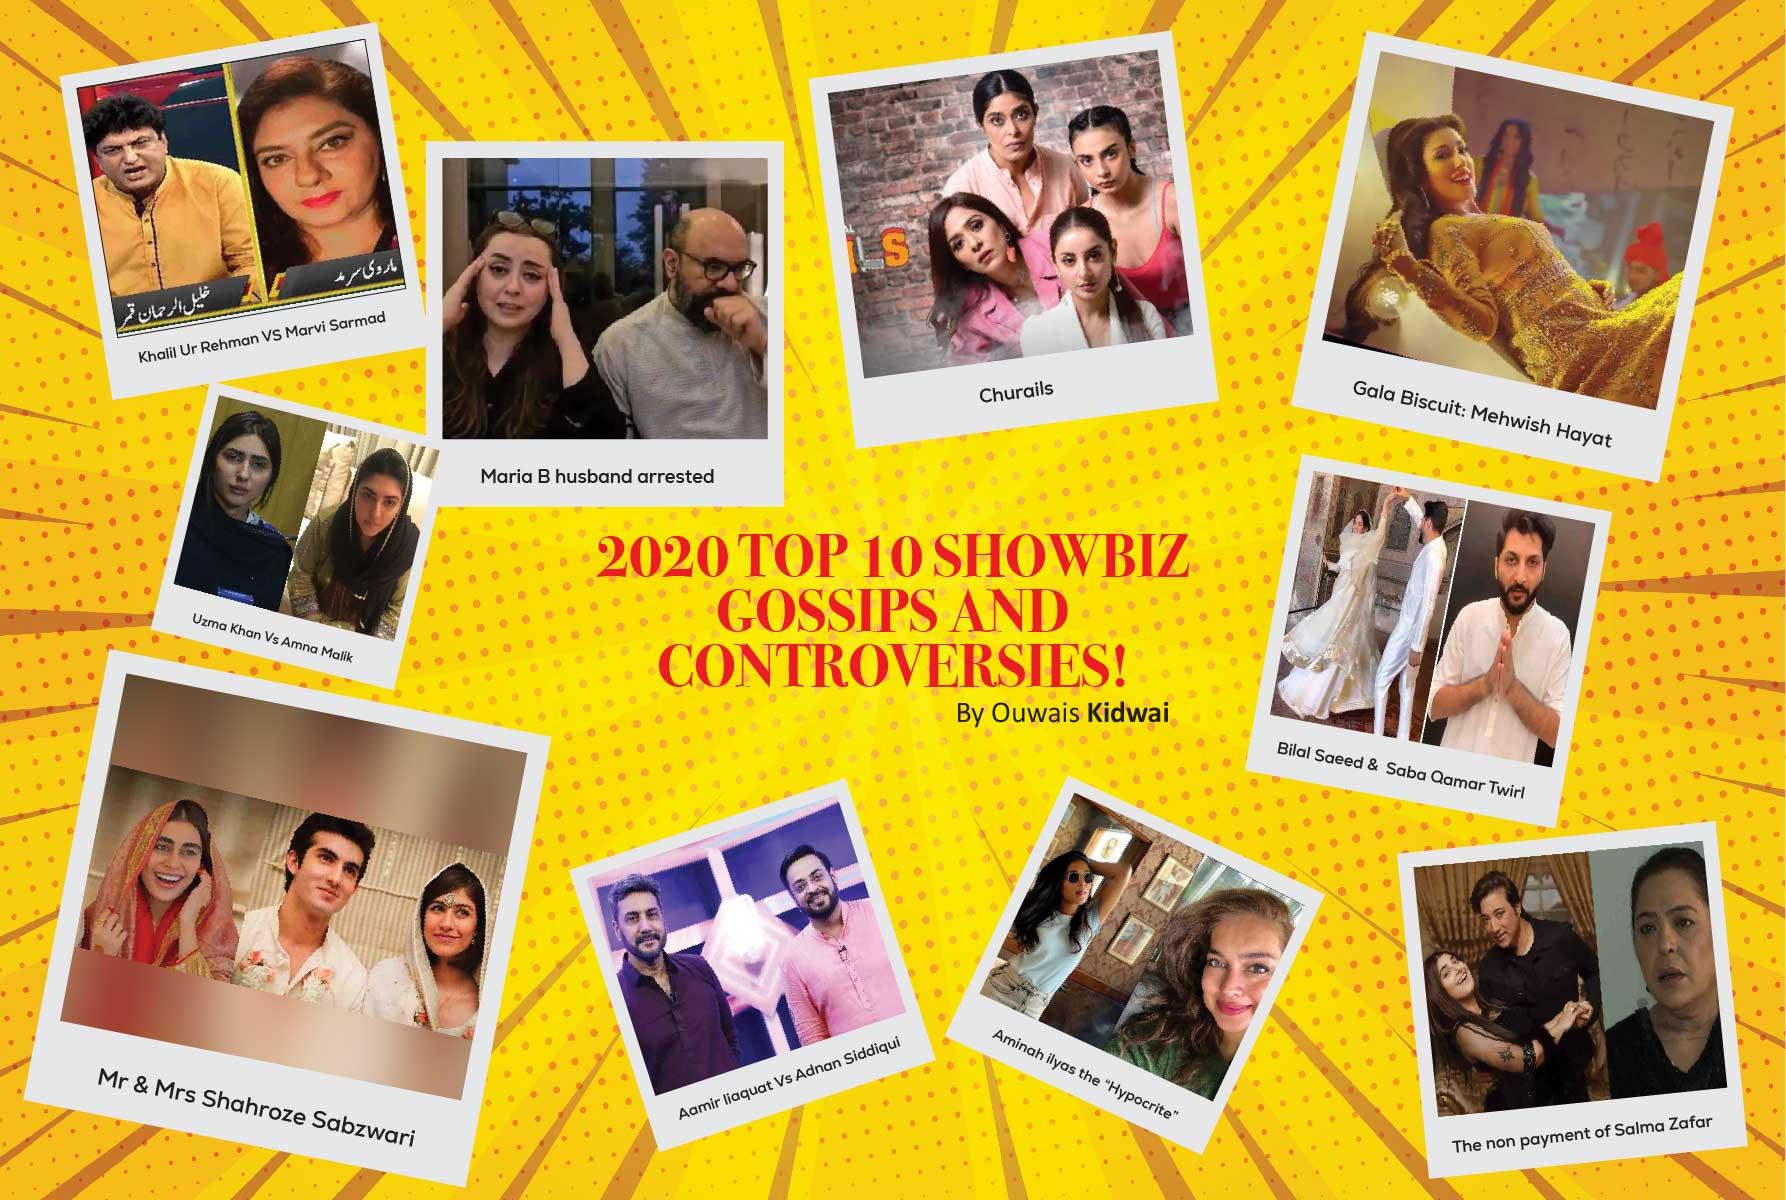 2020_TOP_10_SHOWBIZ_GOSSIPS_AND_CONTROVERSIES!